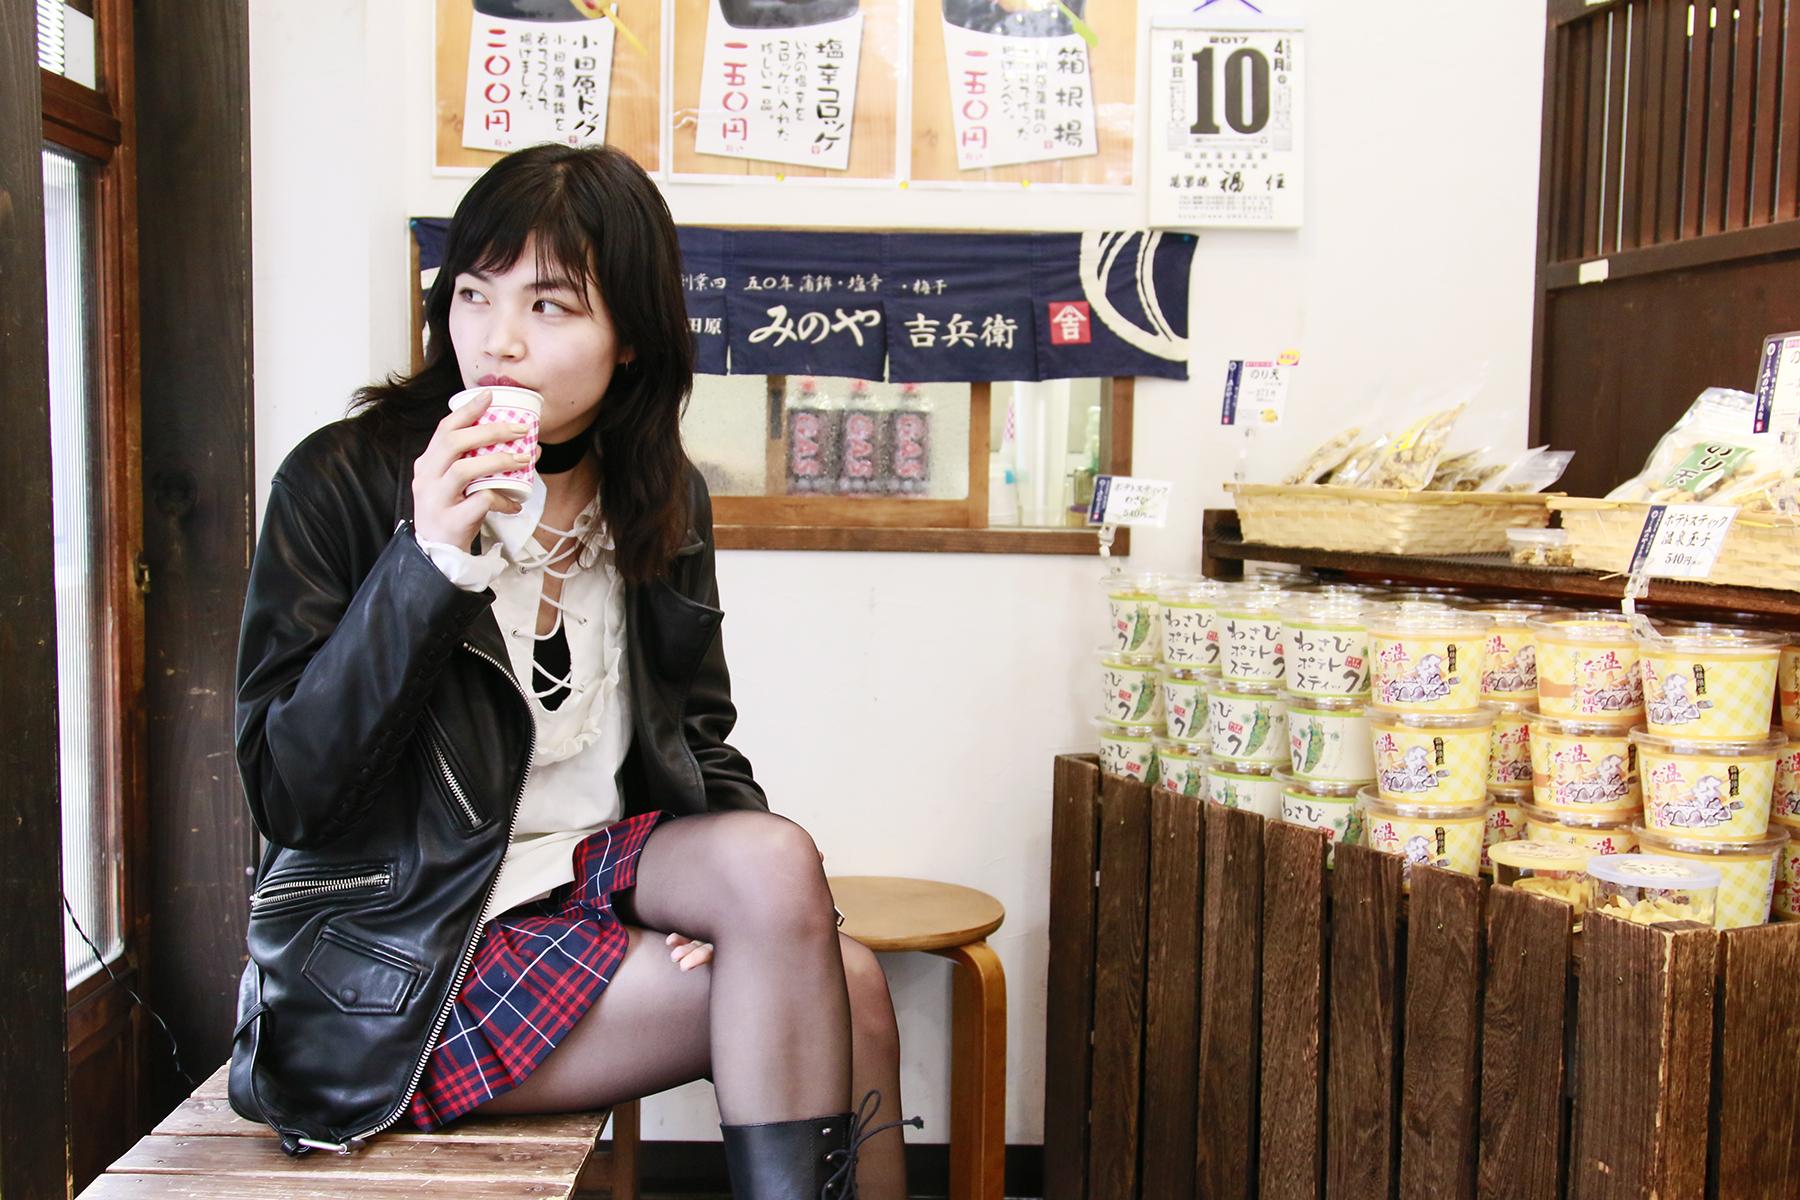 ALLSAINTS_Rina Fukushi_7